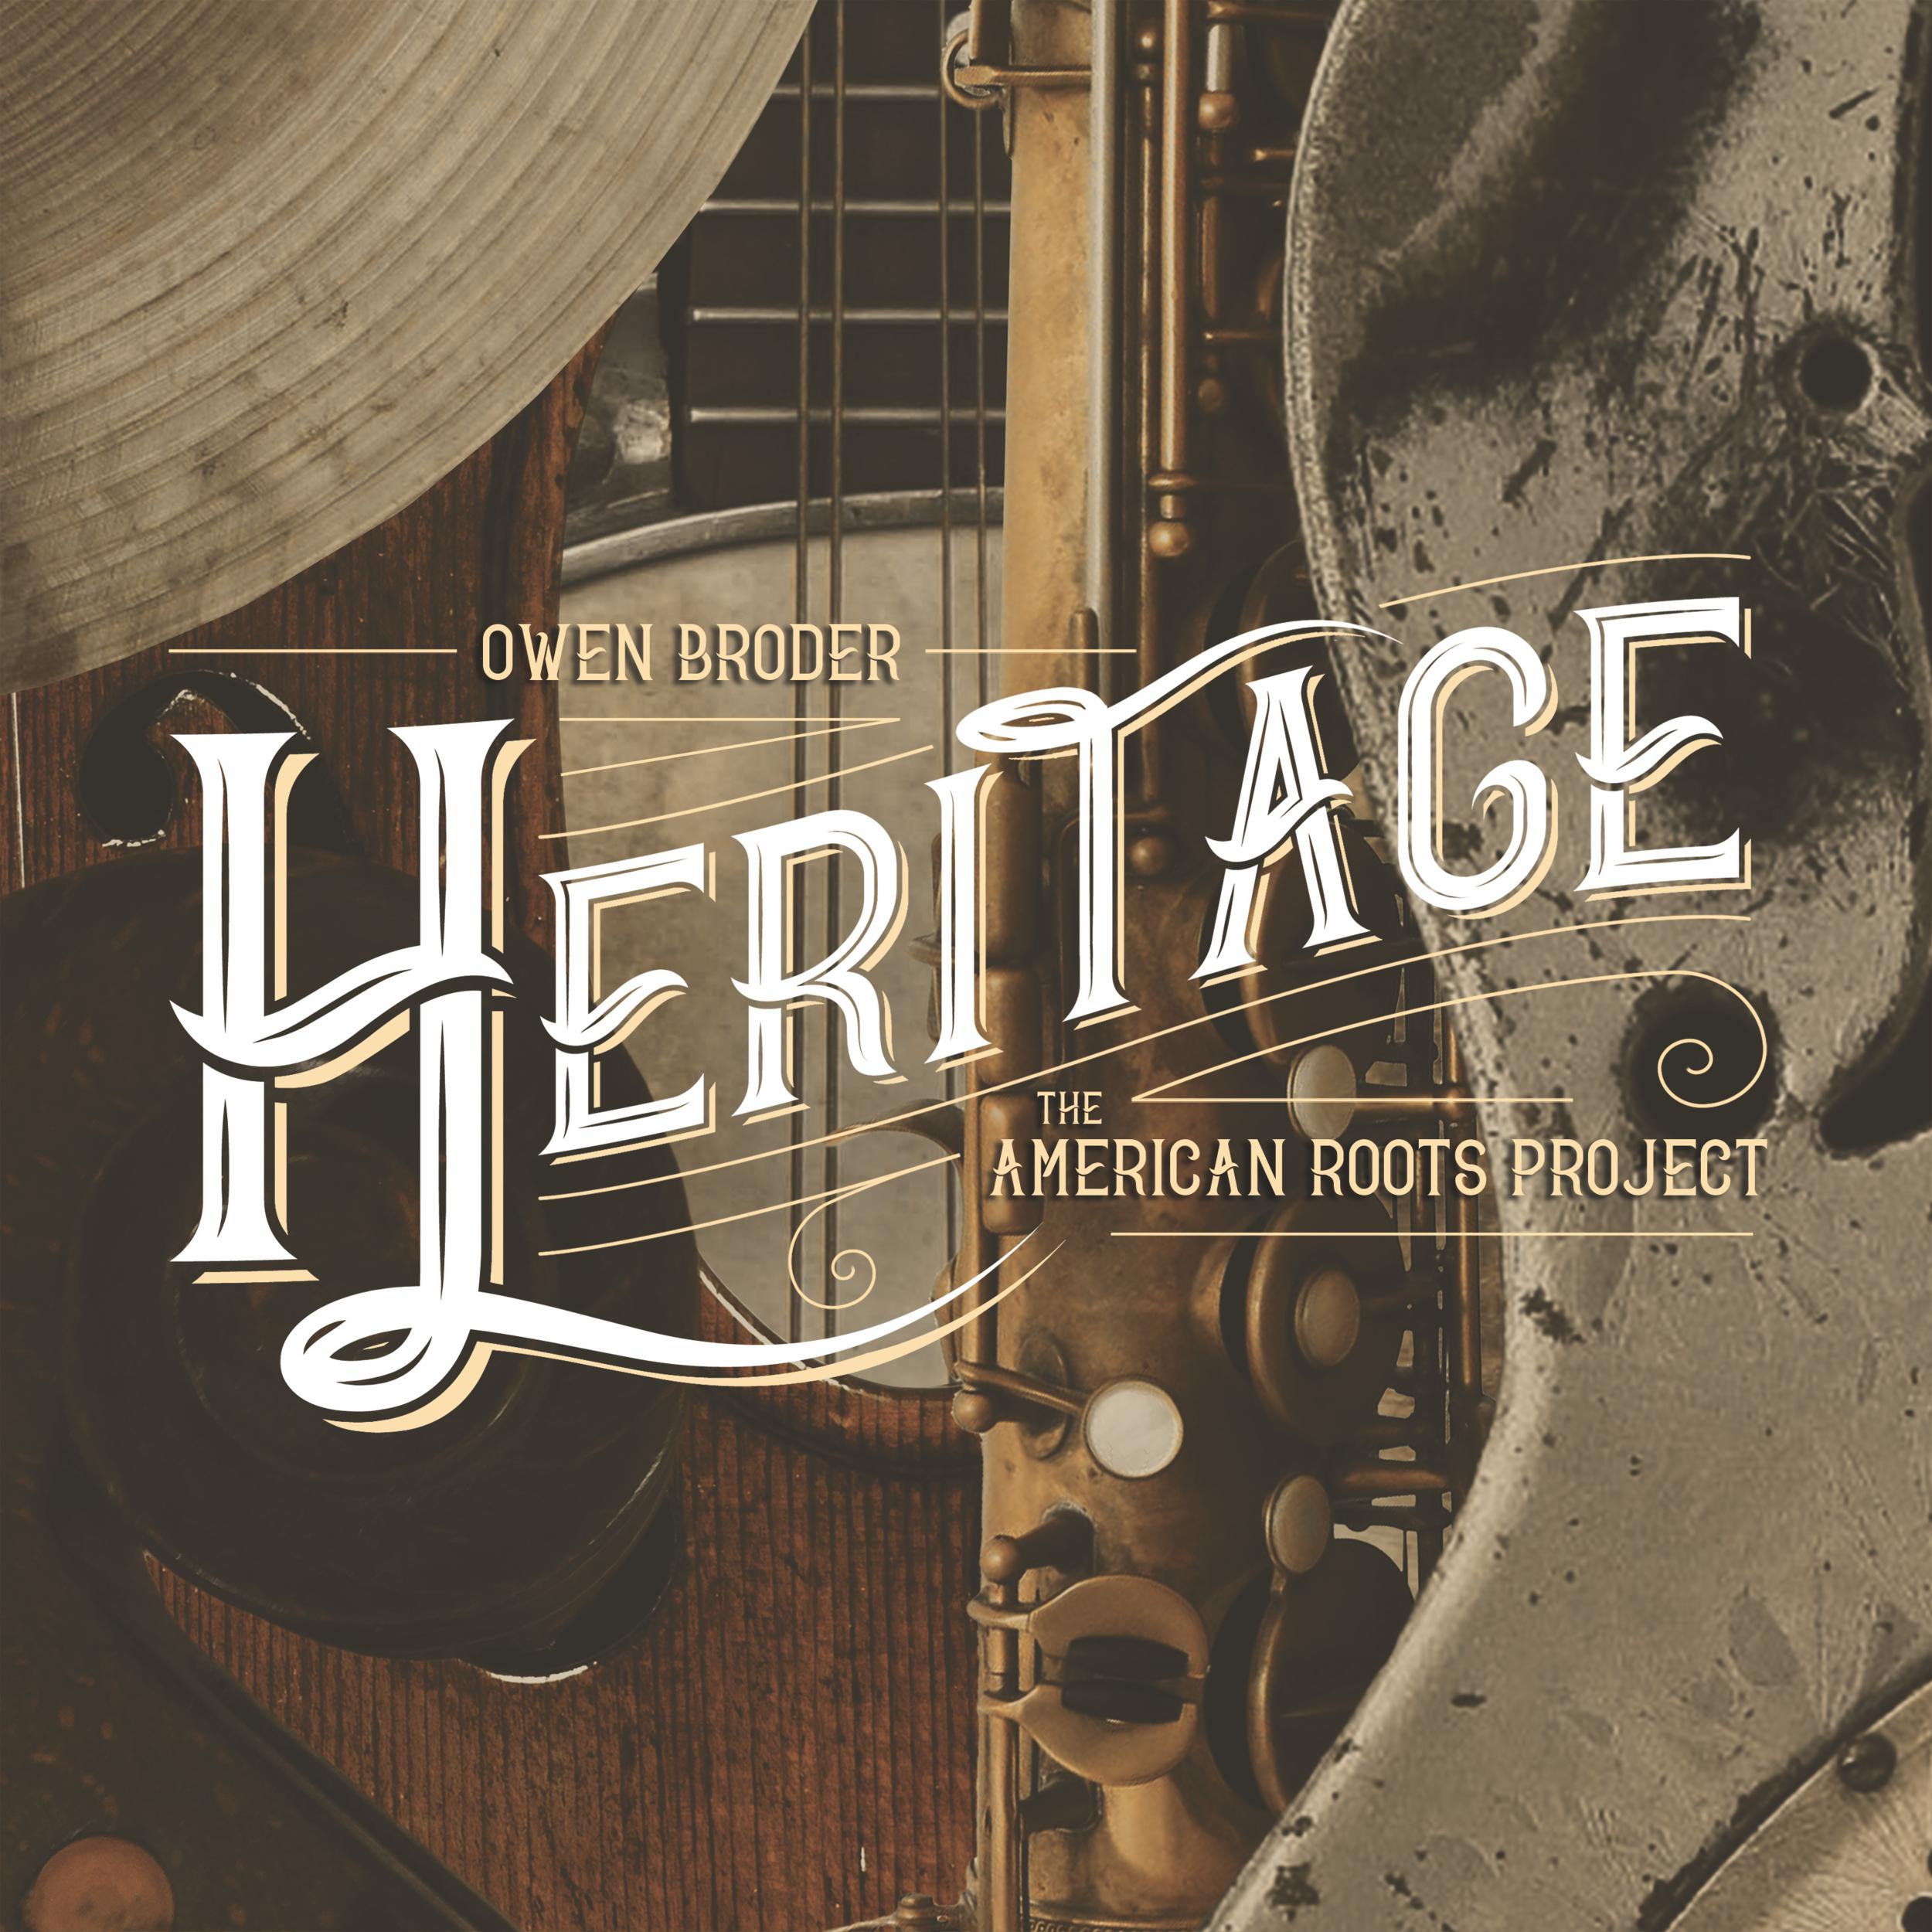 Heritage  (2018) Owen Broder's American Roots Project   ArtistShare®  |  iTunes  |  Amazon